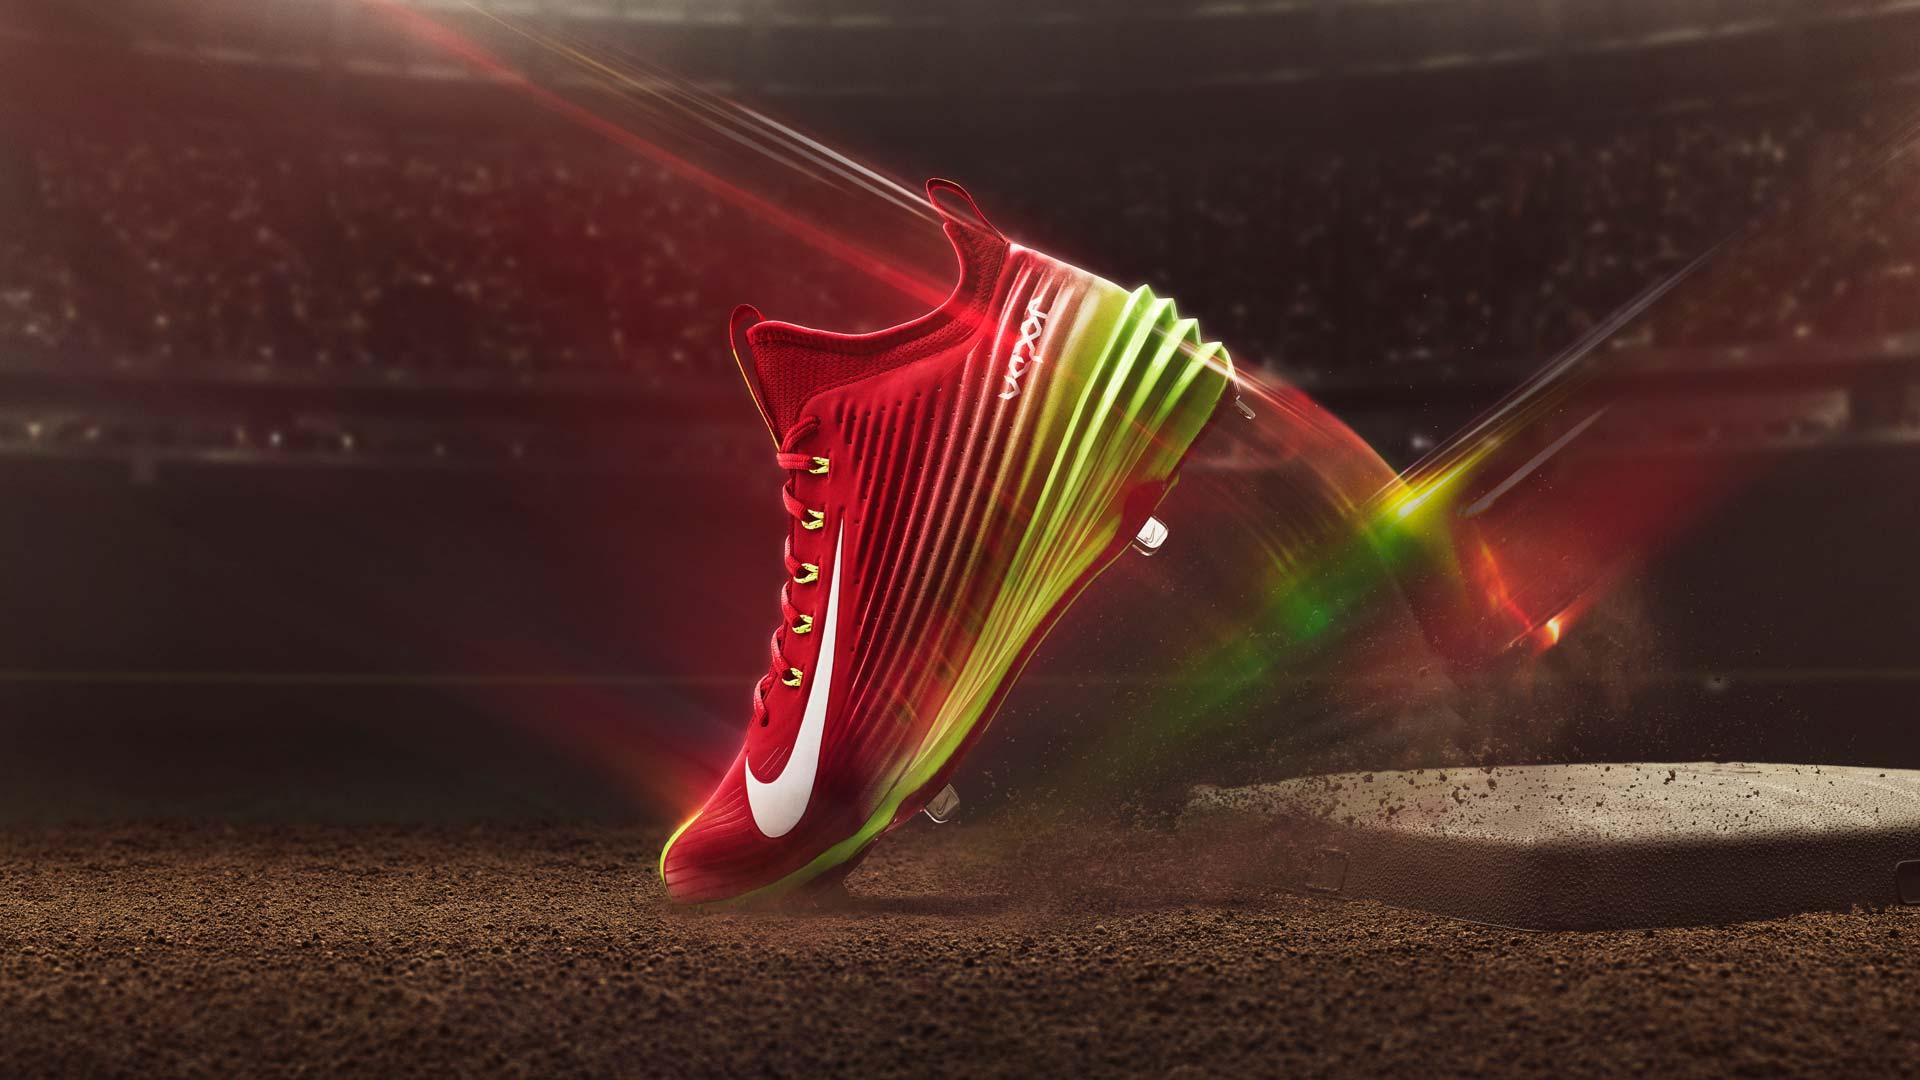 Trout-Vapor-062014-FTR-Nike.jpg